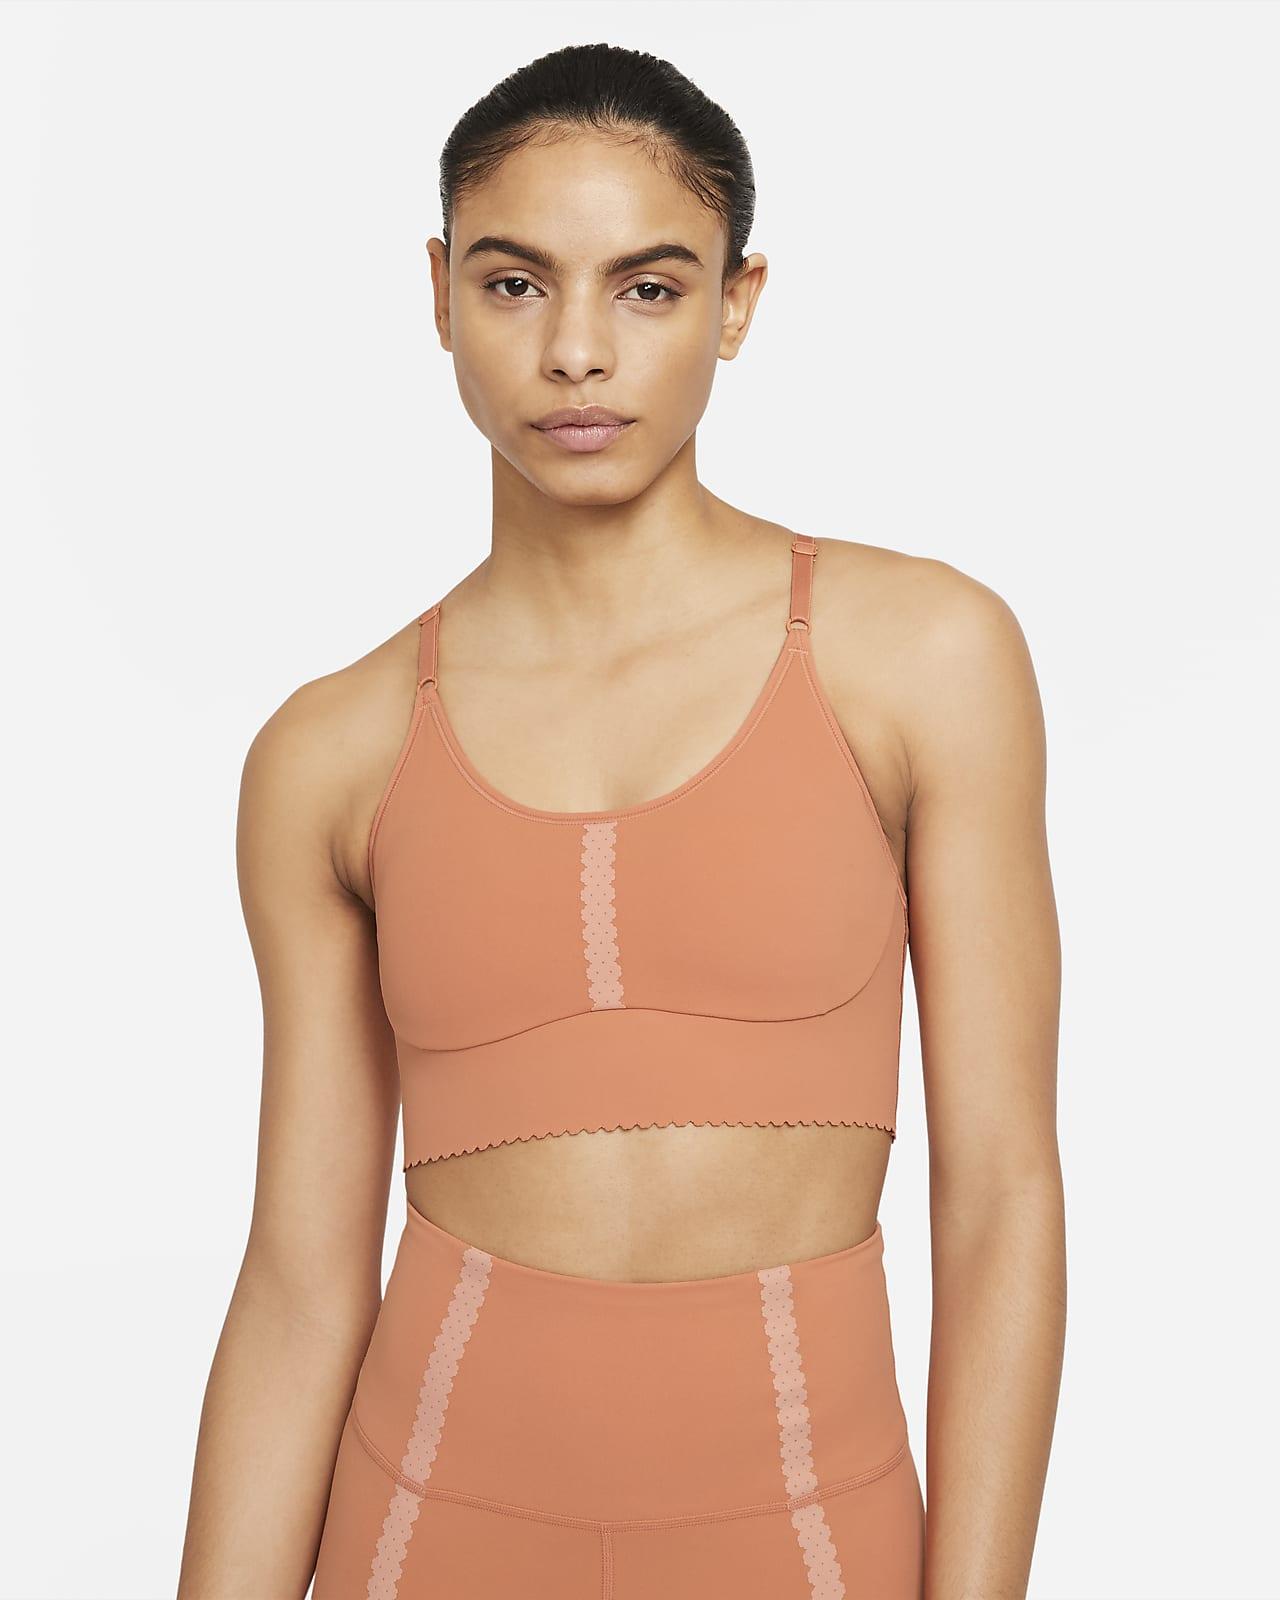 Nike Yoga Dri-FIT Indy Women's Light-Support Padded Eyelet Sports Bra